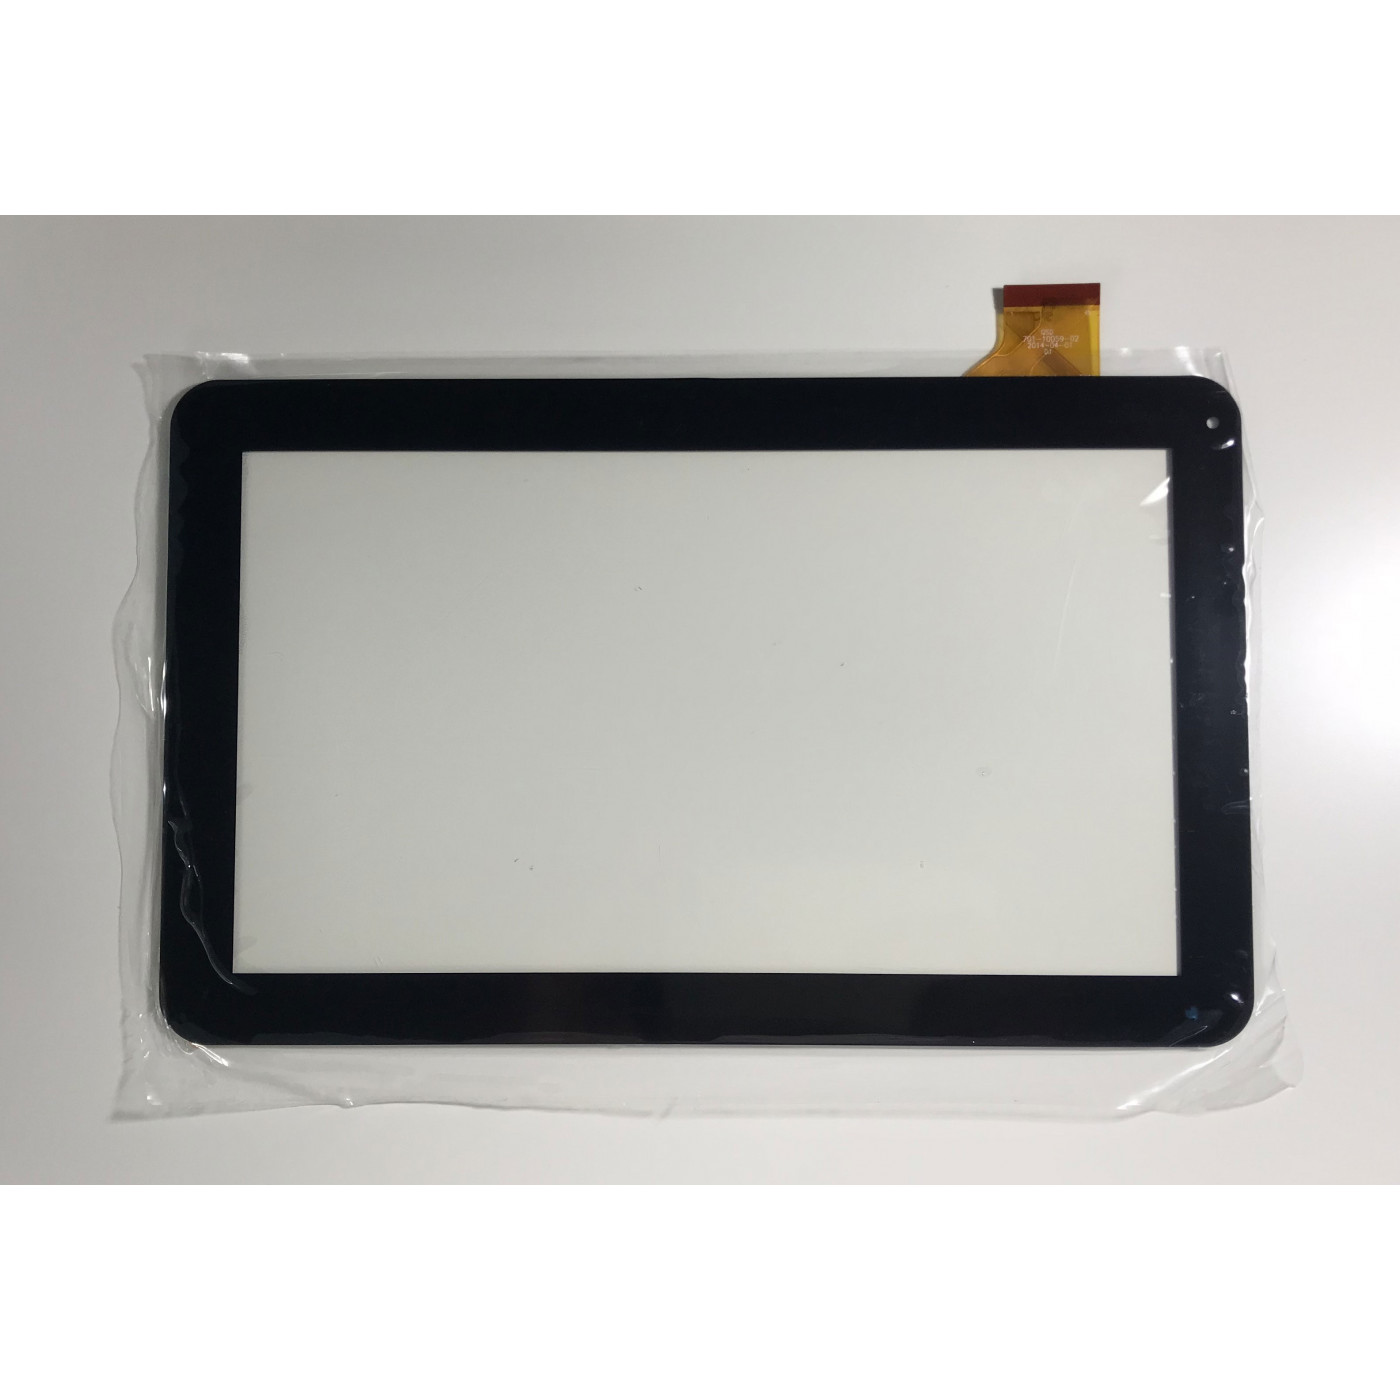 TOUCH SCREEN MAJESTIC TAB 301 3G GLAS Tablet Digitizer 10.1 Schwarz